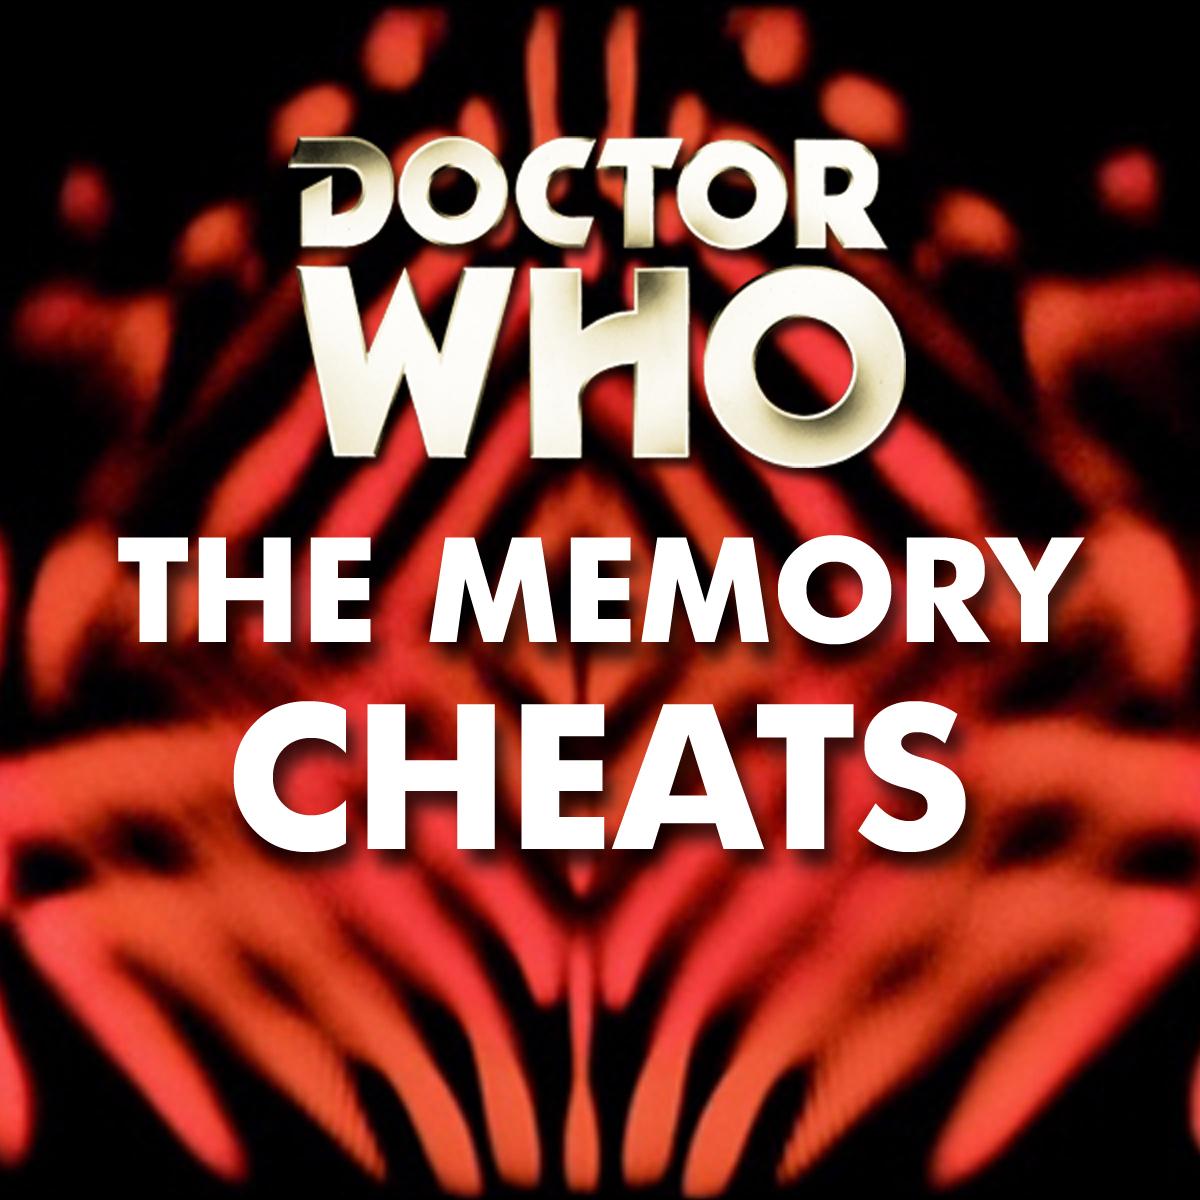 The Memory Cheats